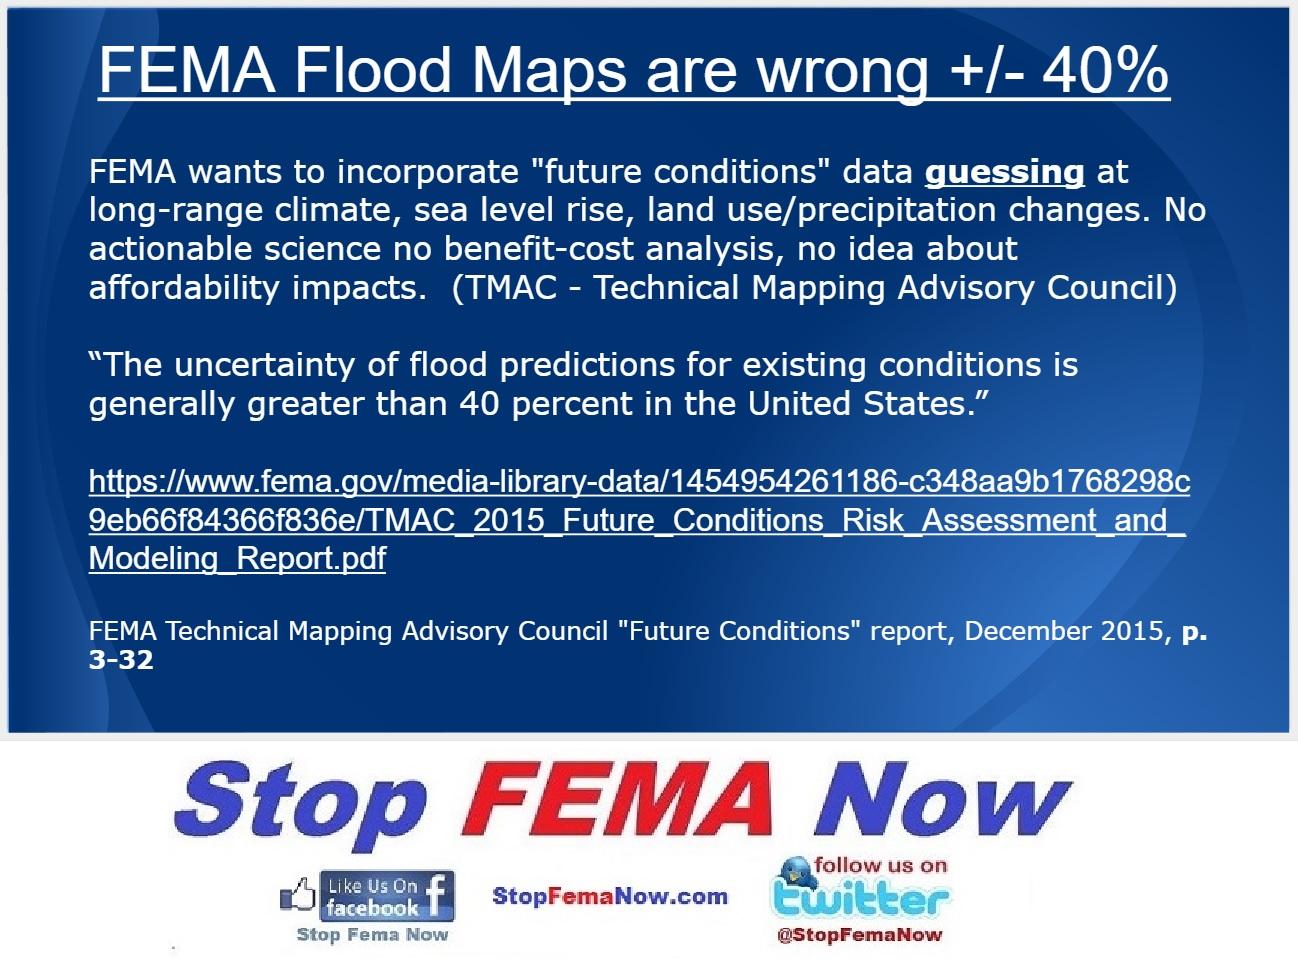 Blog Stop FEMA Now - Us fema regions map